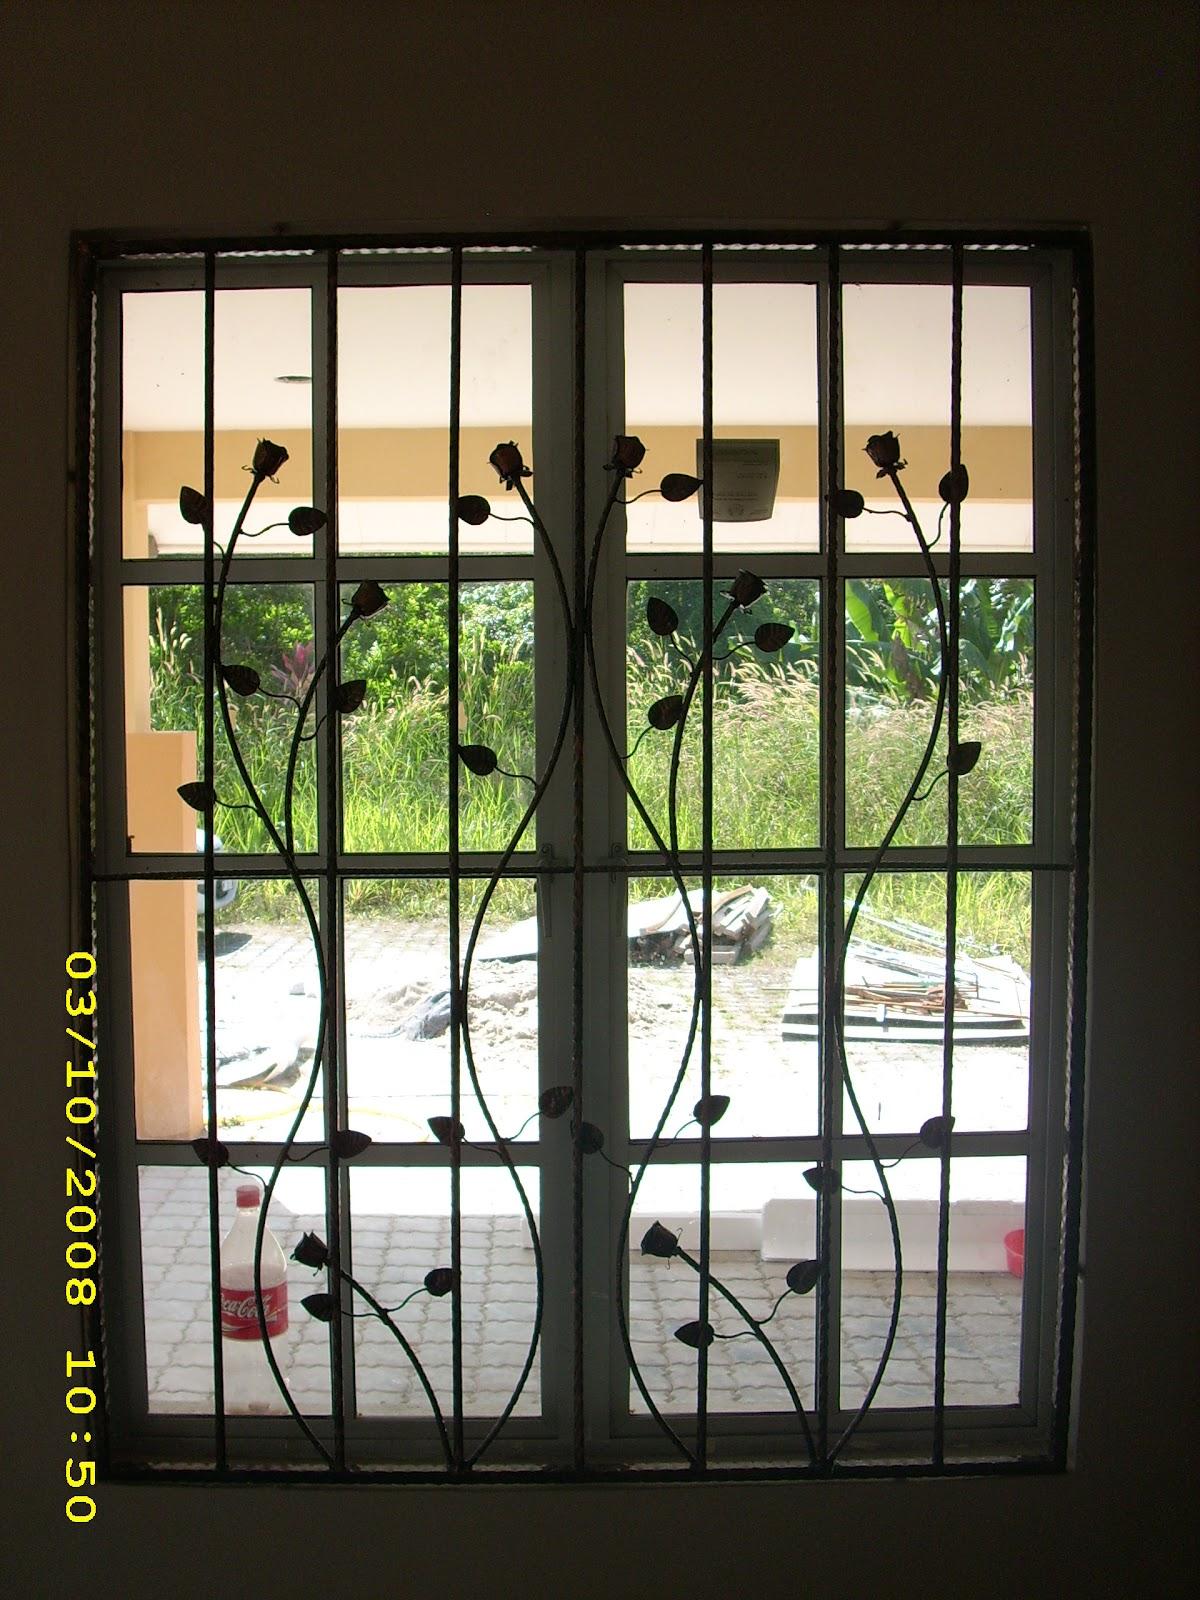 Windows with iron bars windows 7 harmony workshelf 11 for Window design iron